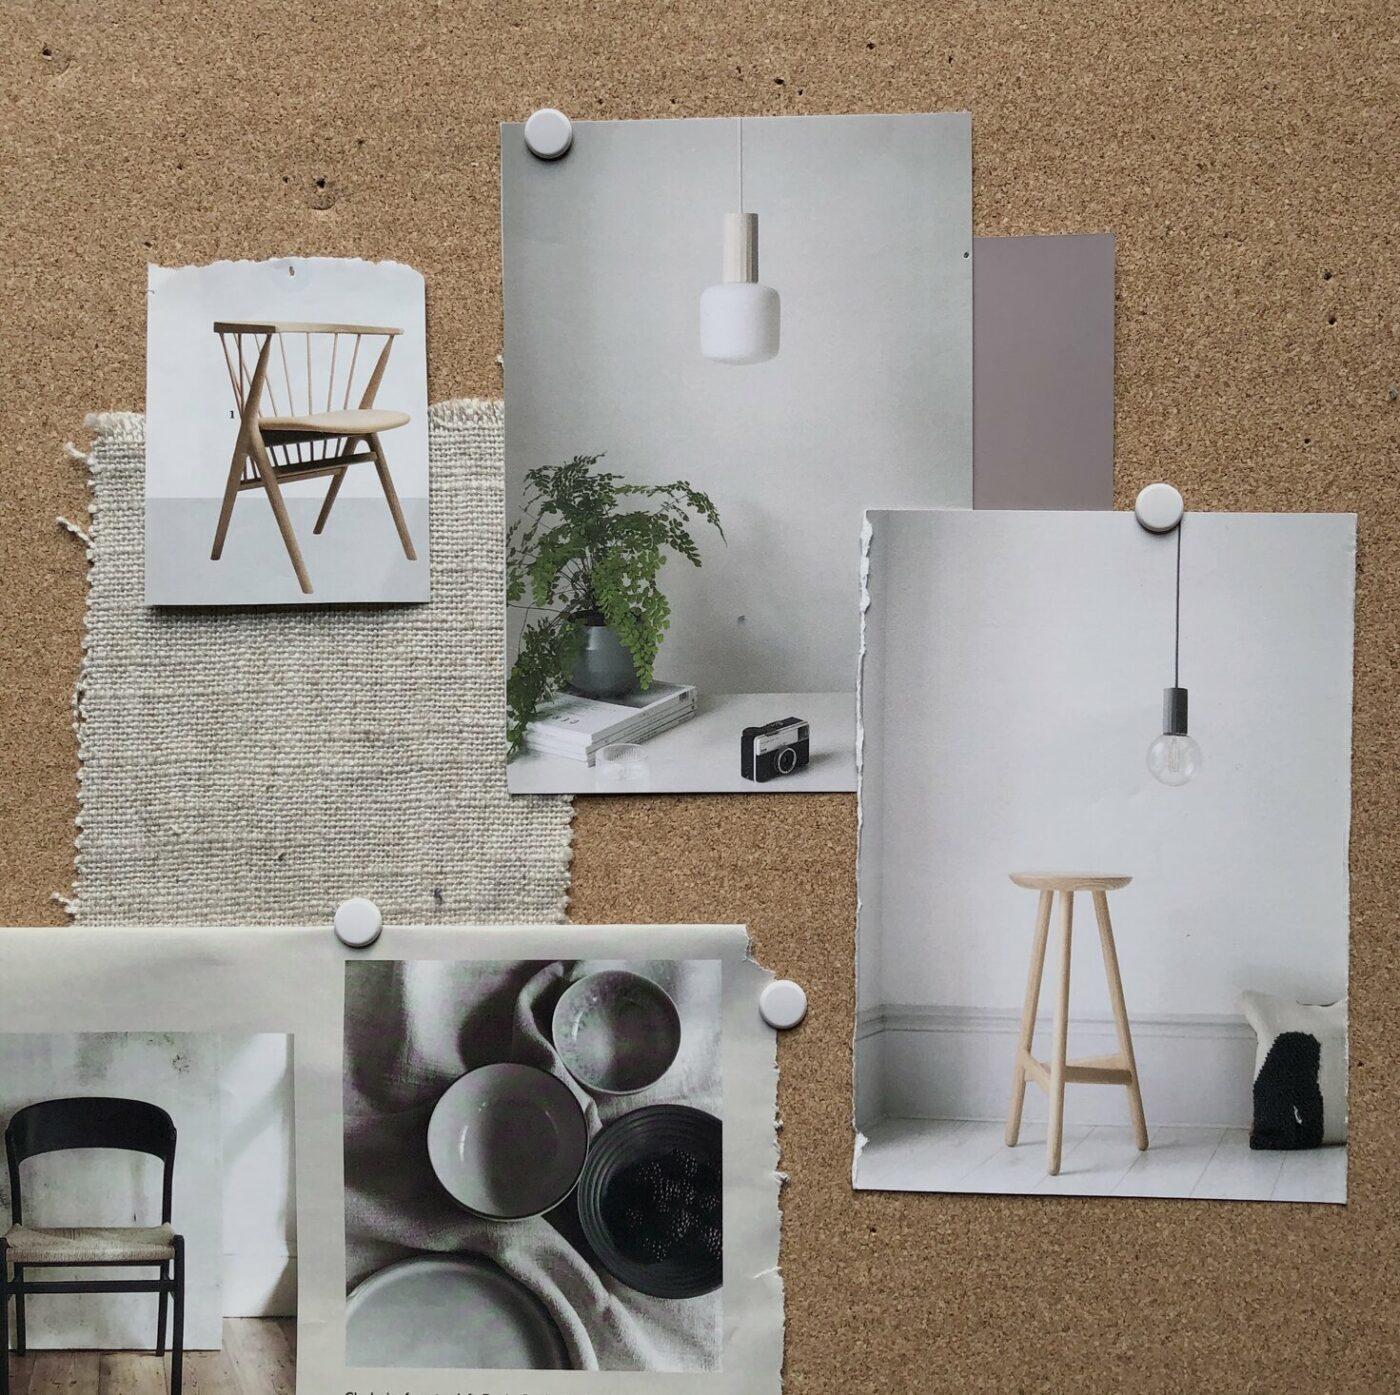 Japandi: The Meeting of Scandinavian Minimalism and Japanese Design